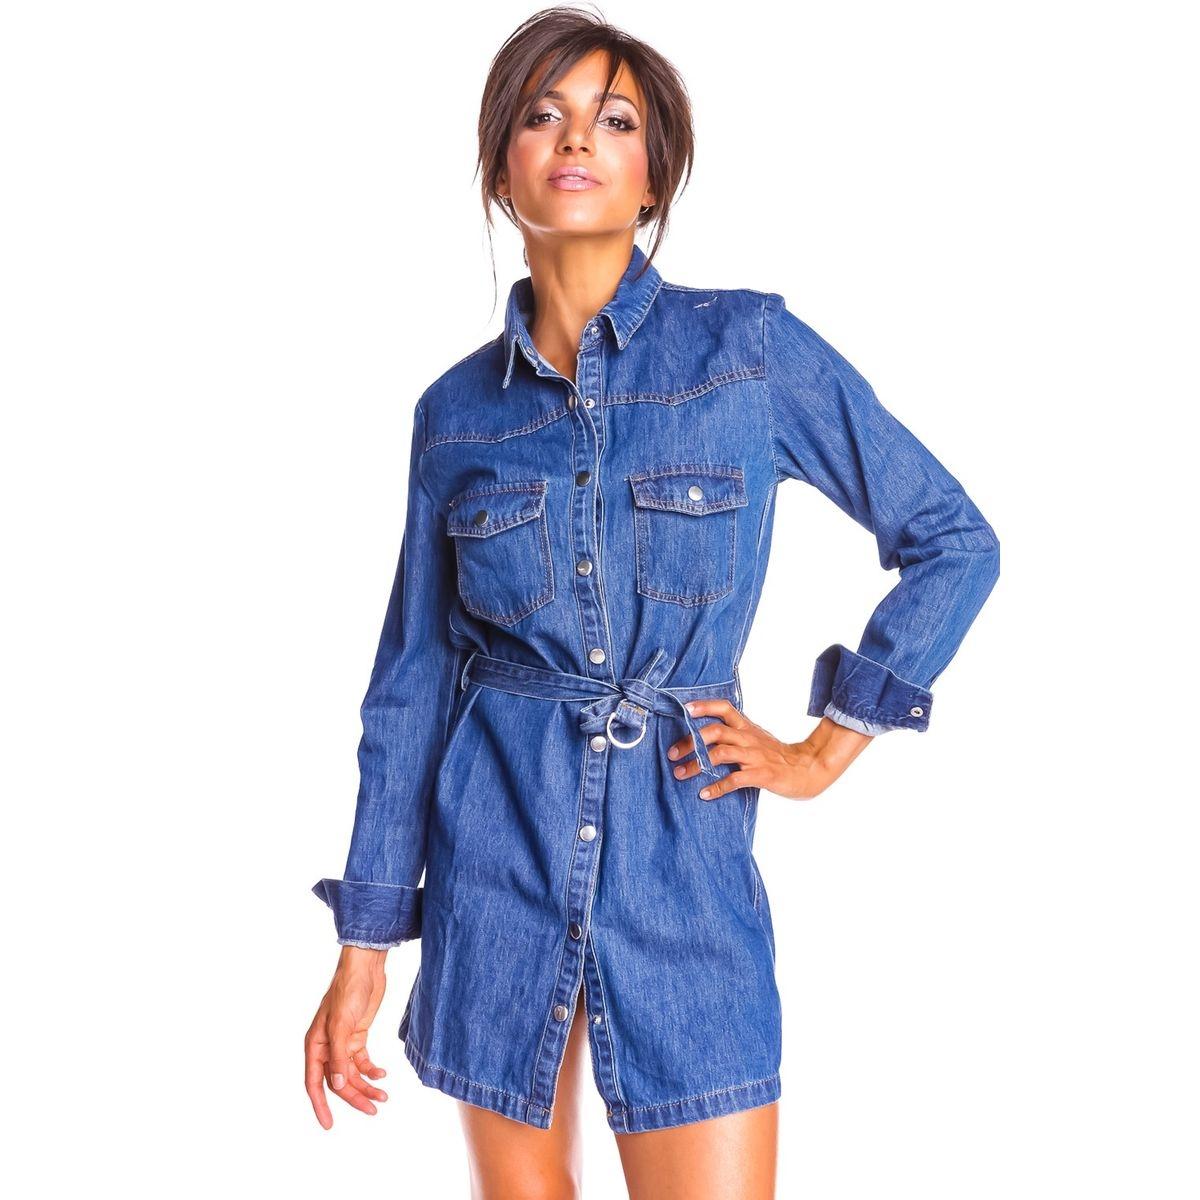 Robe chemise en jean boutonnée